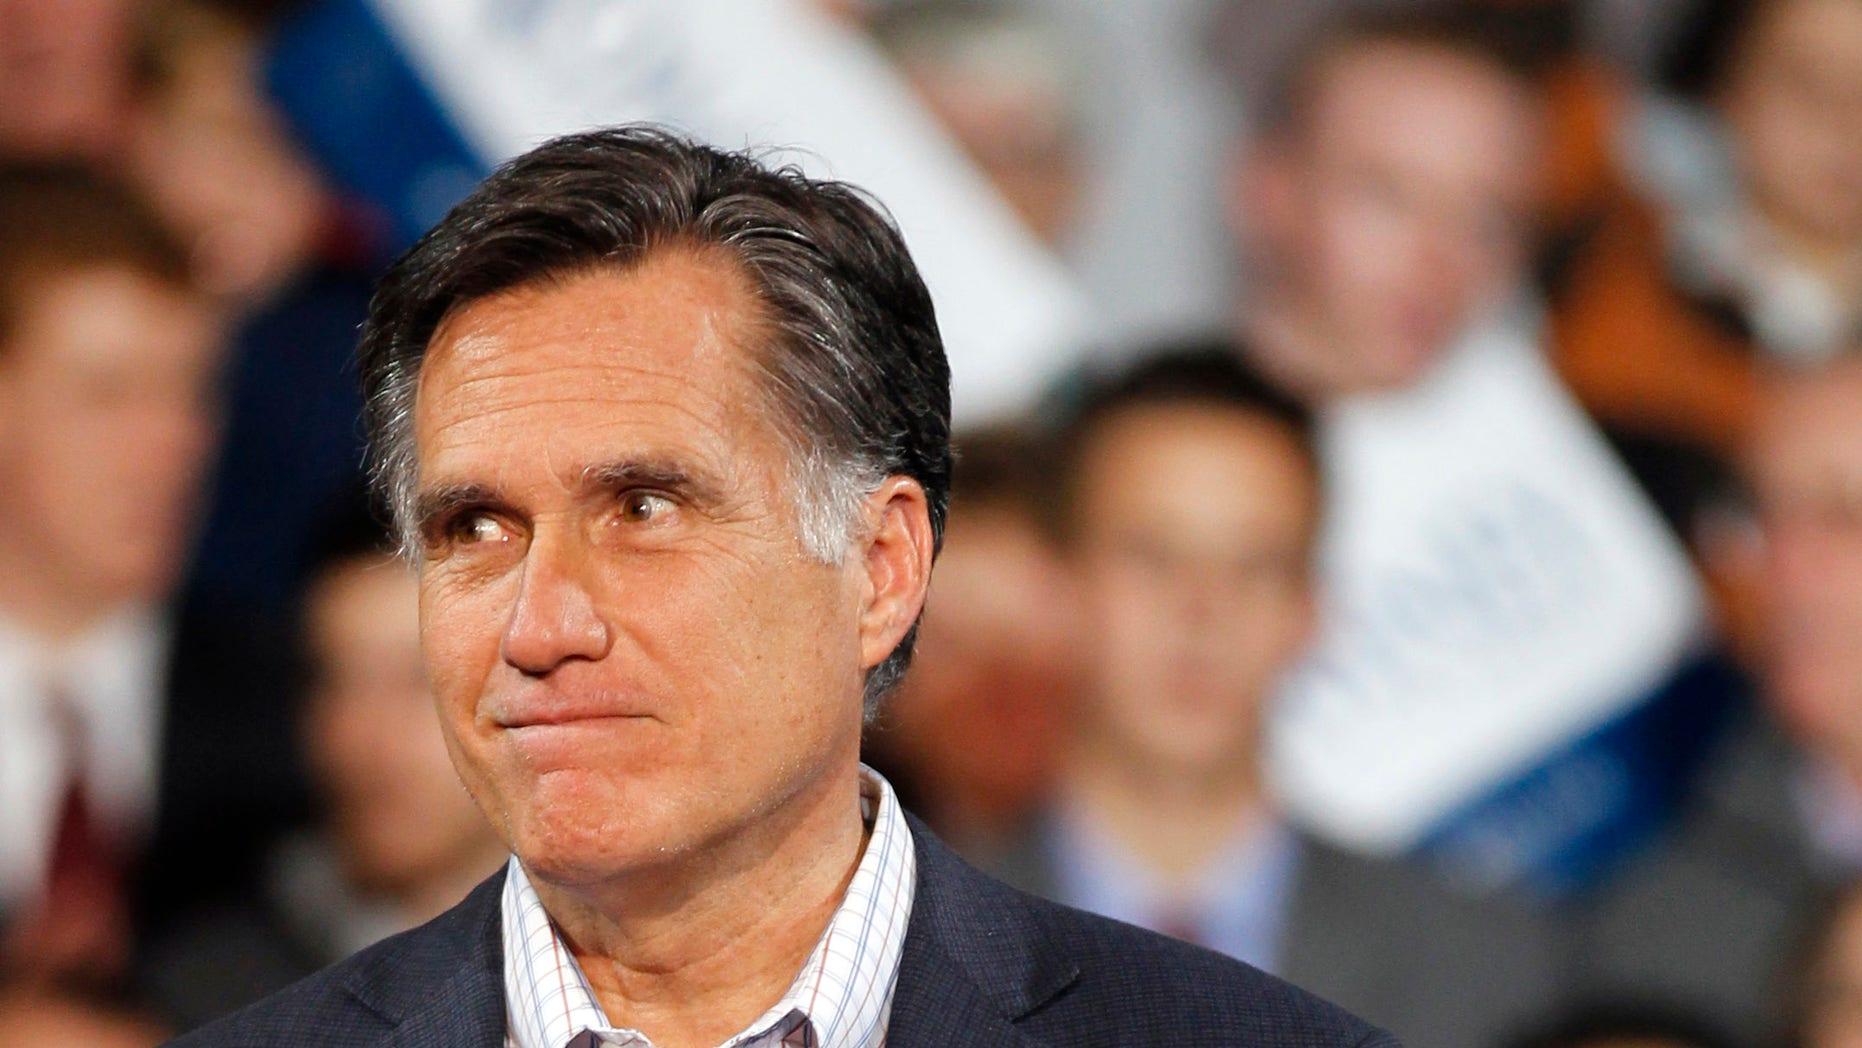 Republican presidential candidate, former Massachusetts Gov. Mitt Romney speaks during a 2012 election night rally in Denver.